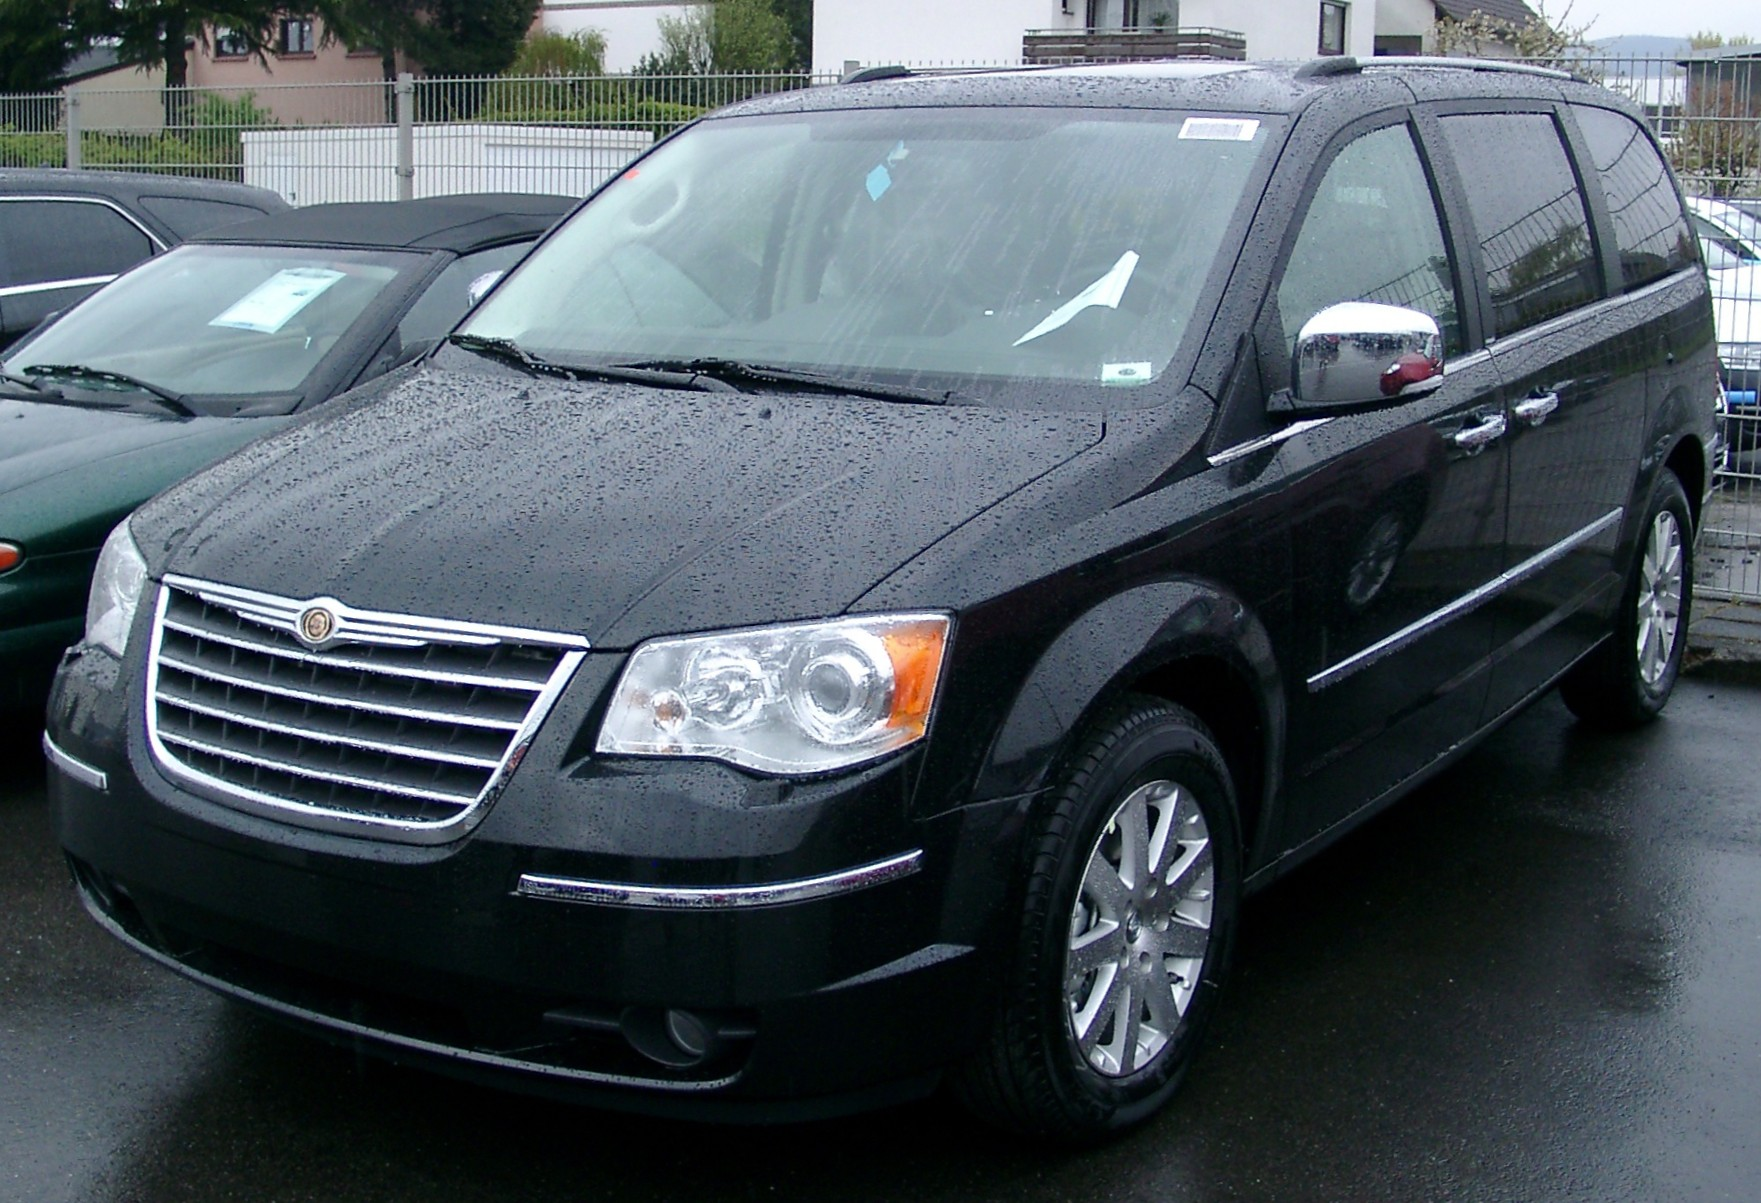 Chrysler Voyager 2010 Photo - 1